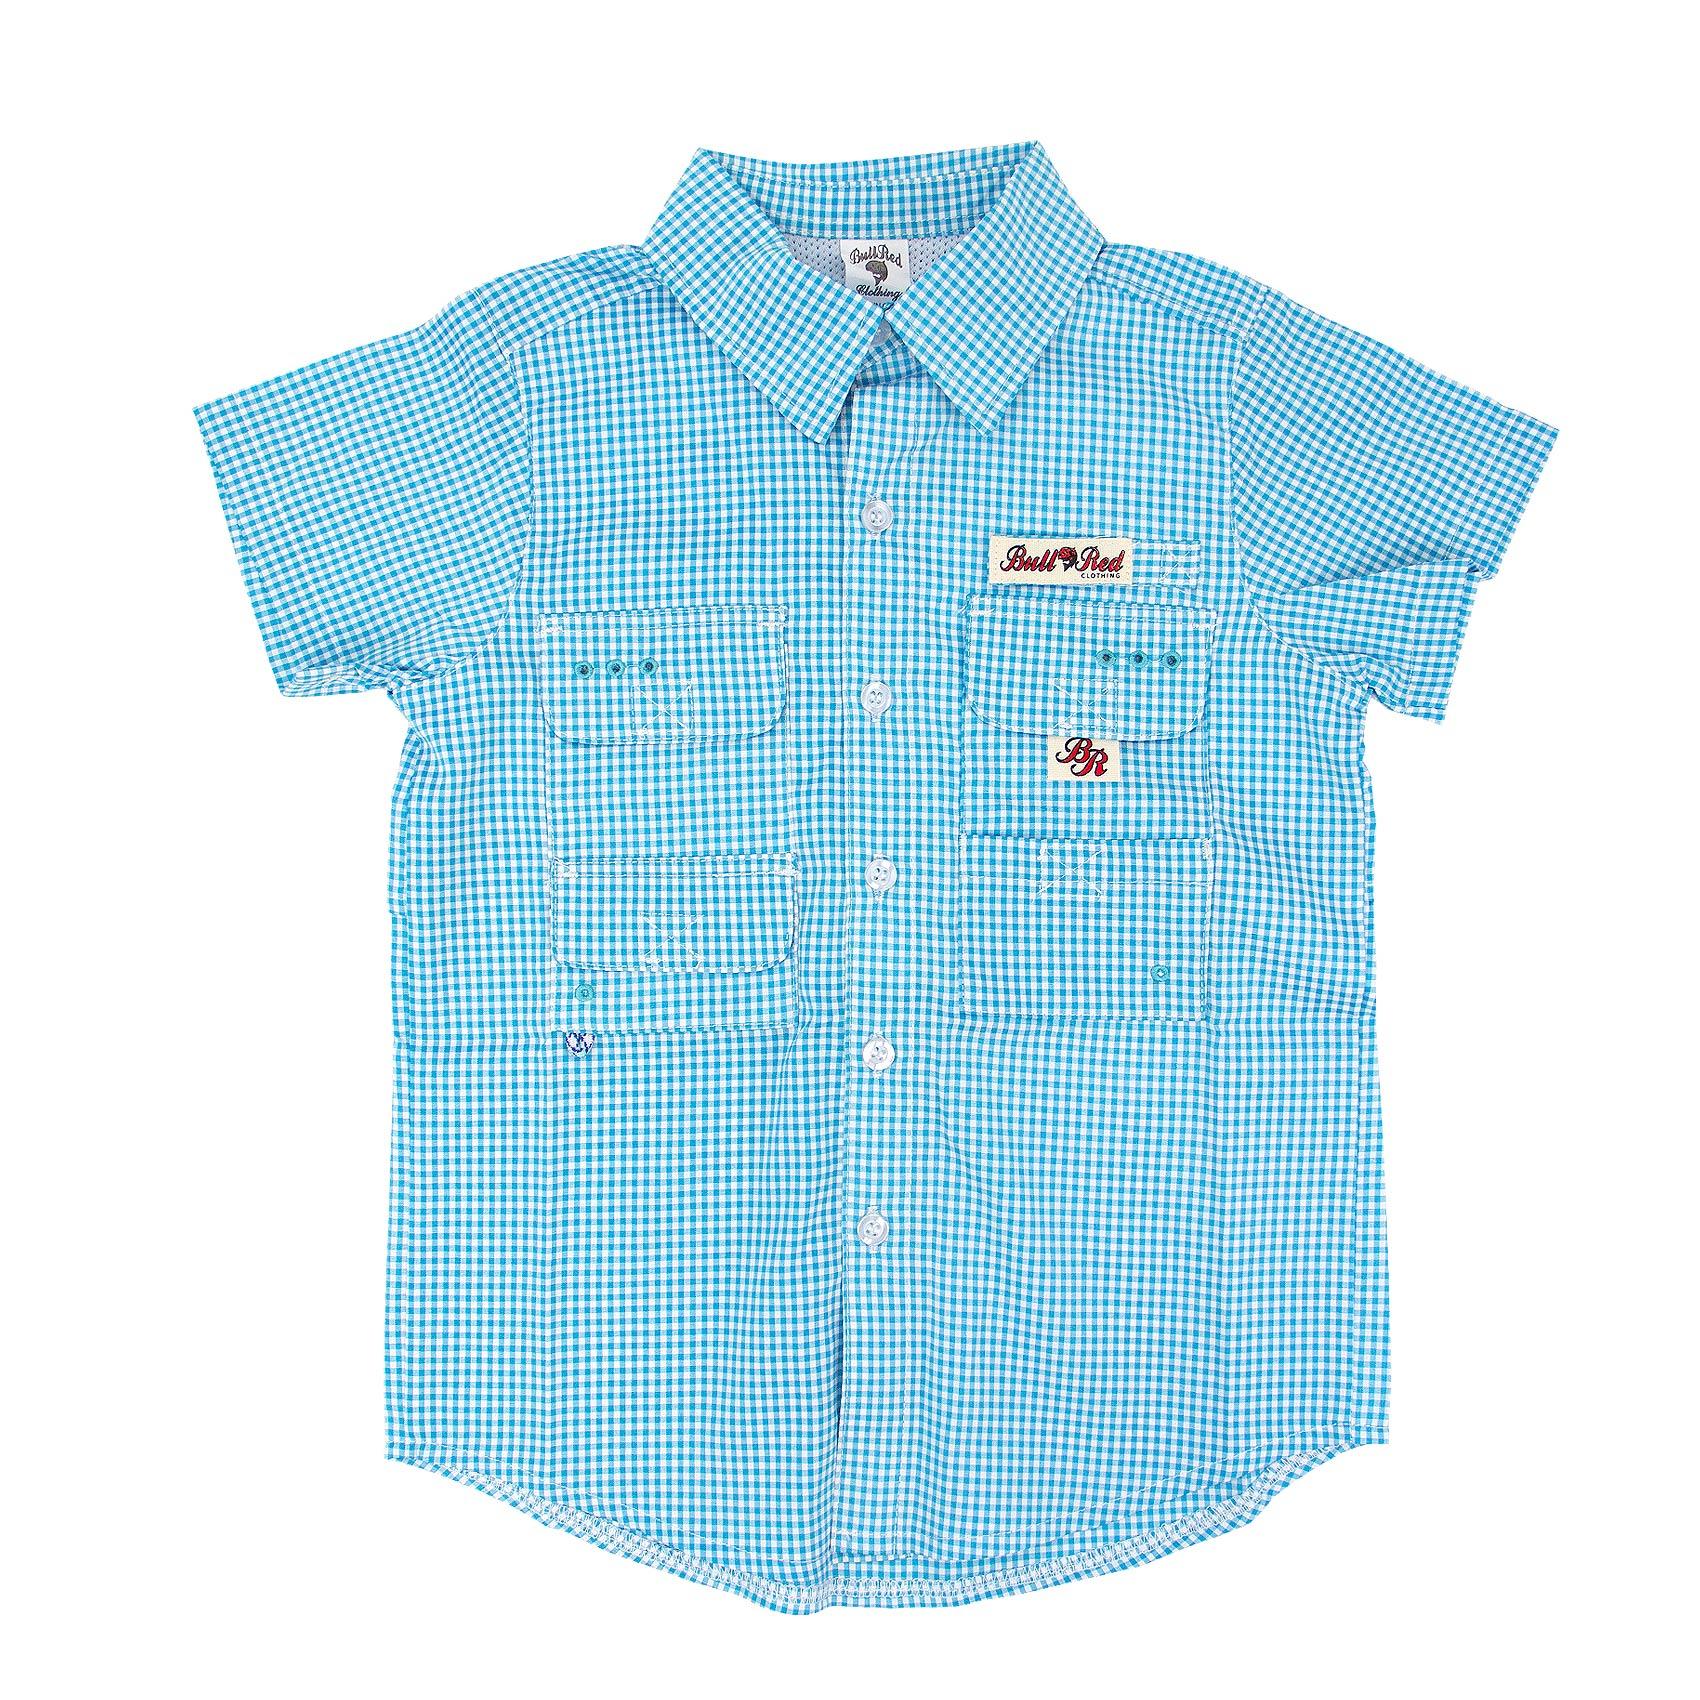 BullRed Aqua Gingham Shirt